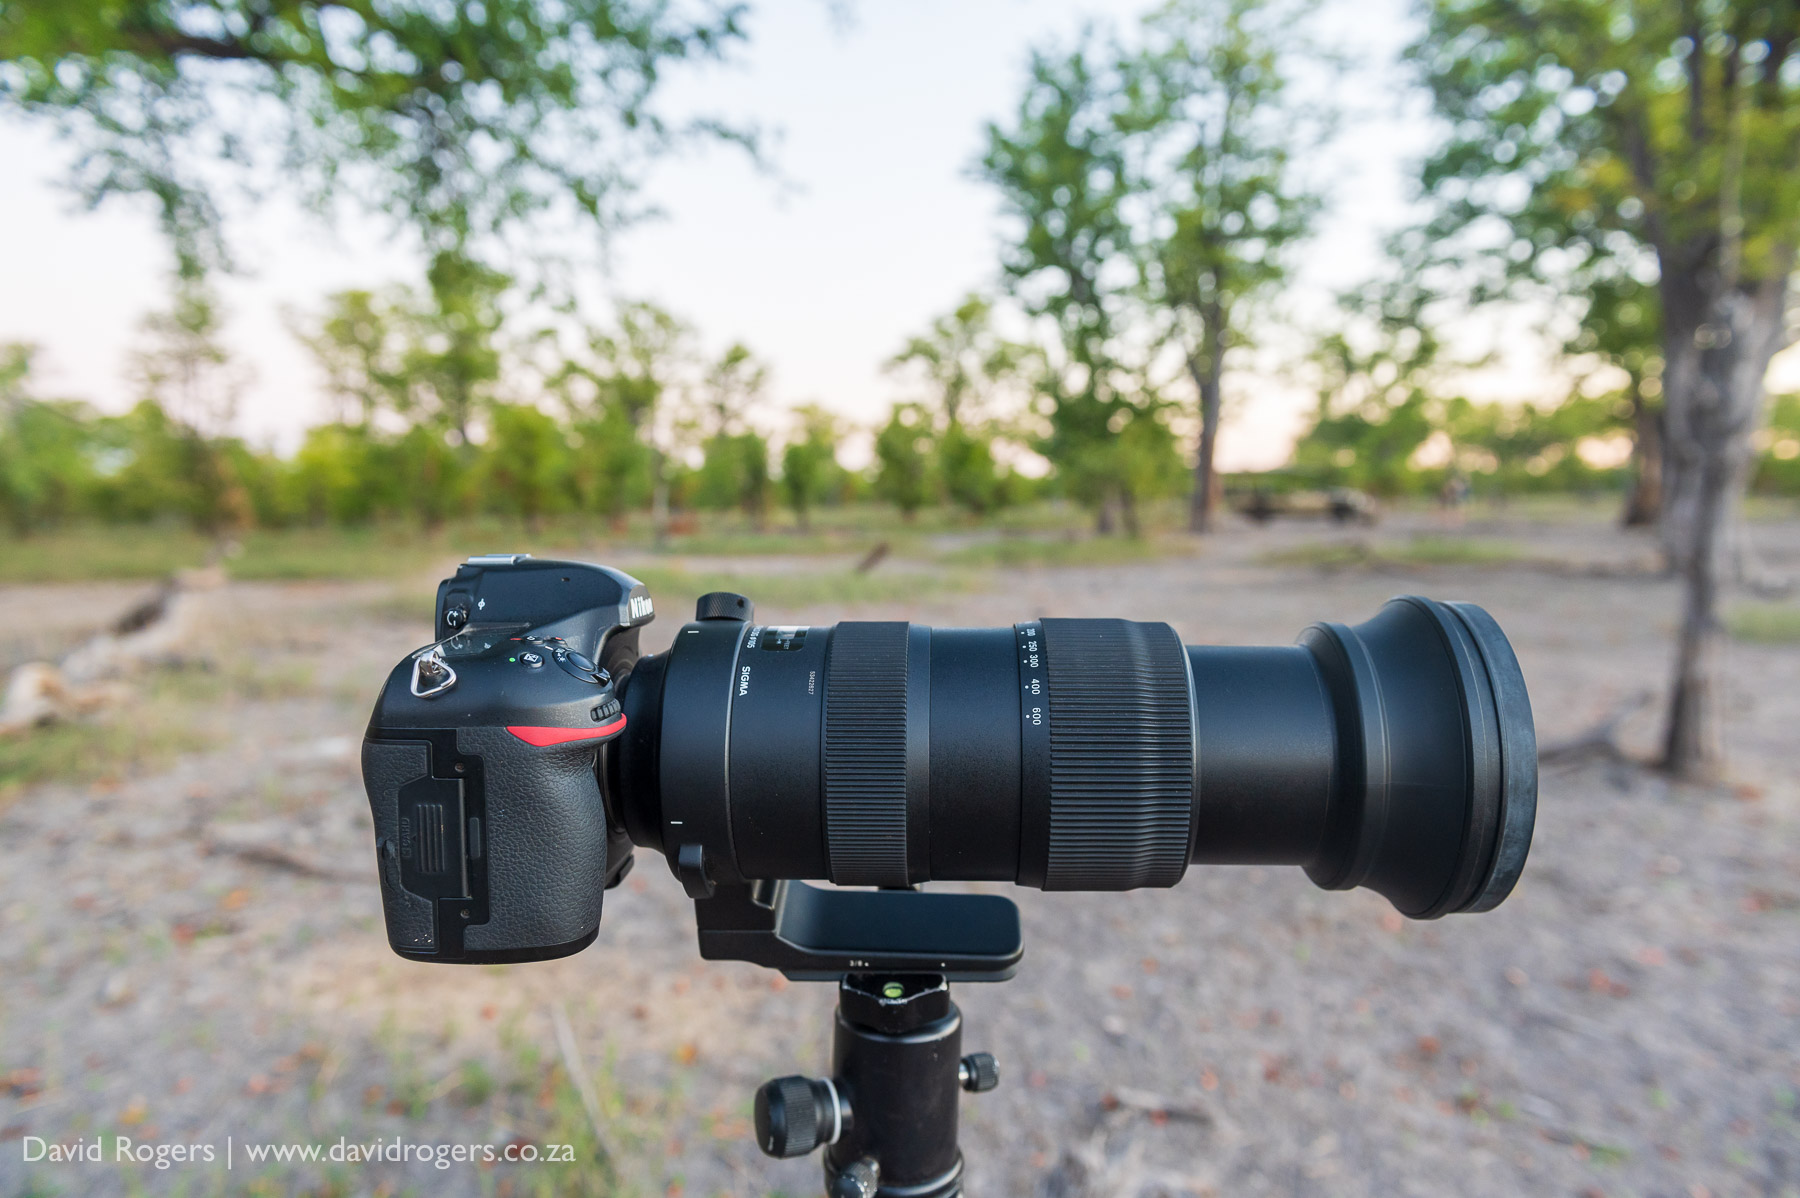 David Rogers Reviews The Sigma 60-600mm f/4.5-6.3 DG OS HSM Sports Lens